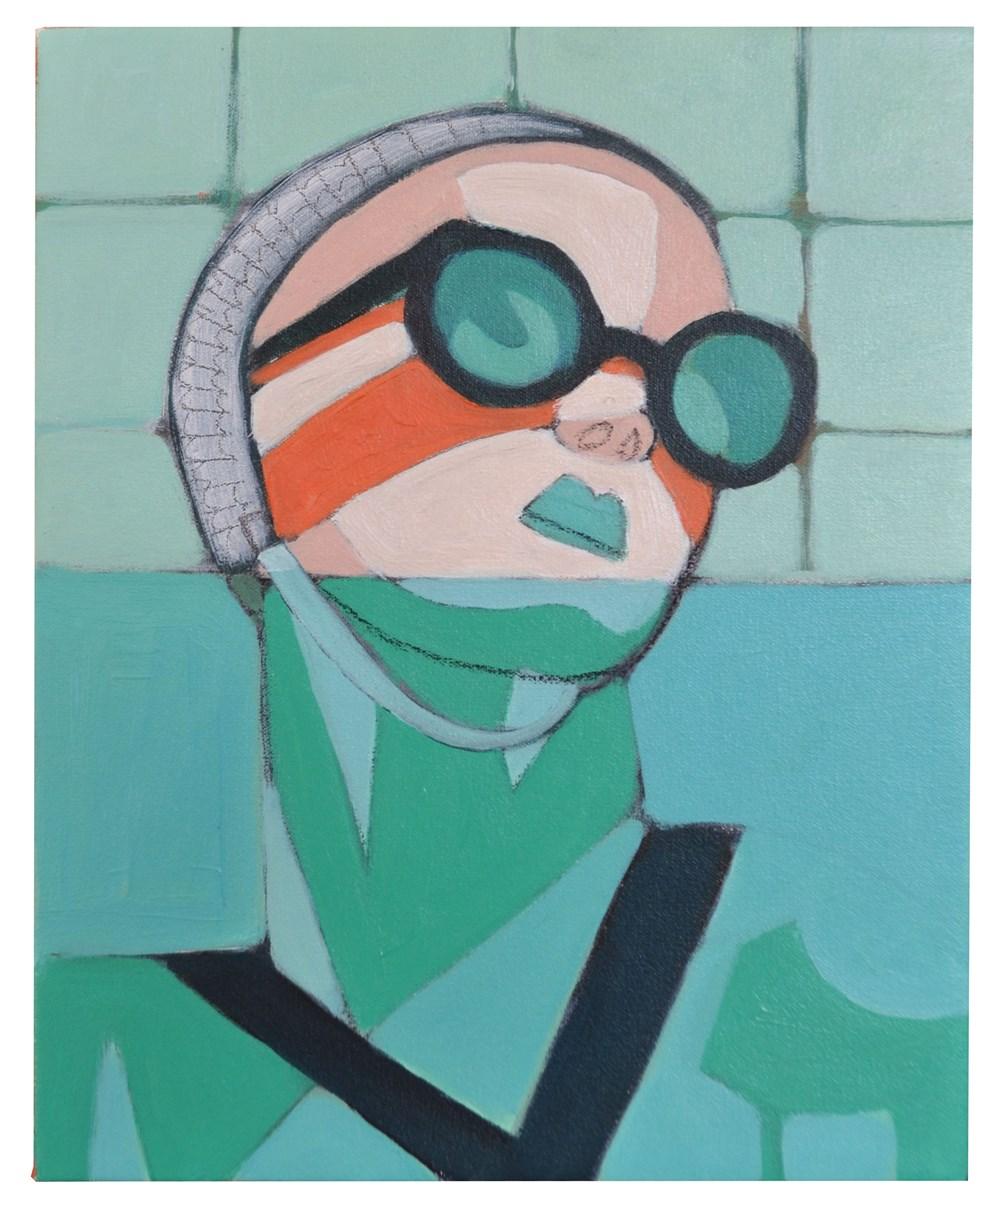 50 x £50 - Lot 37, Poppy Ellis, Submerged